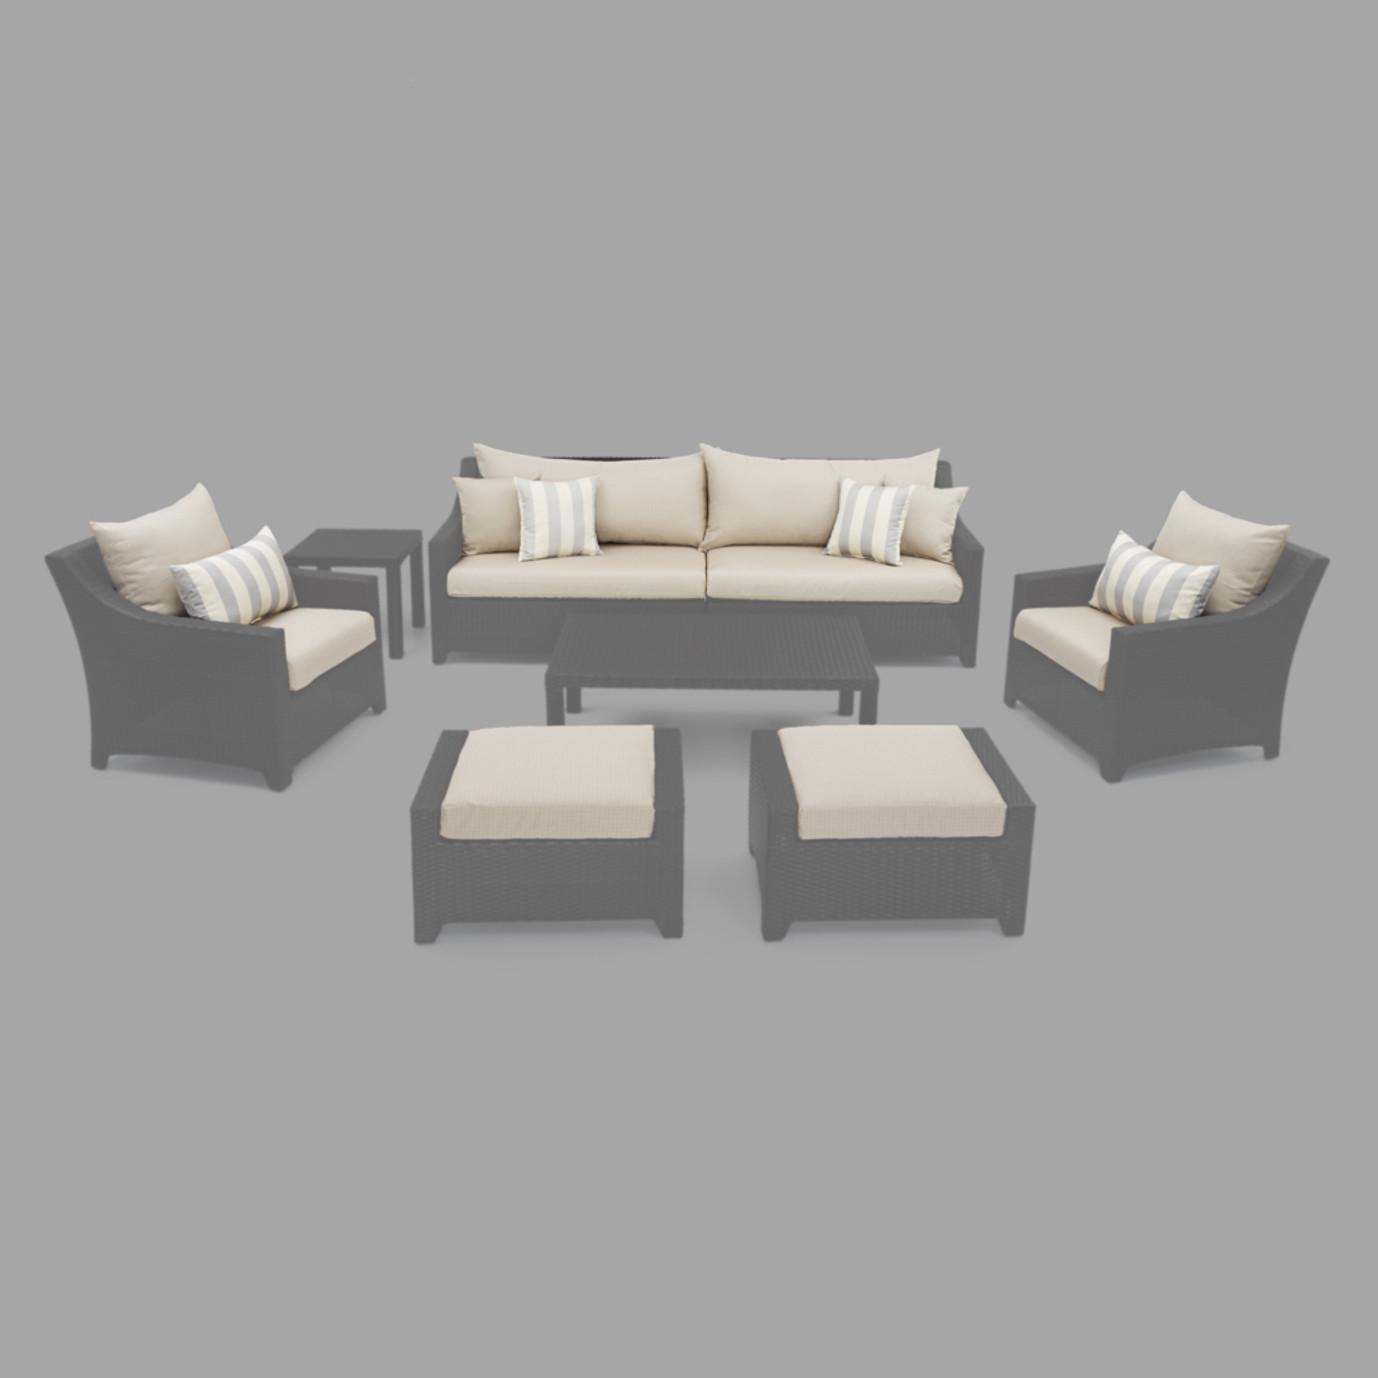 Modular Outdoor 8 Piece Club Cushion Cover Set - Slate Grey